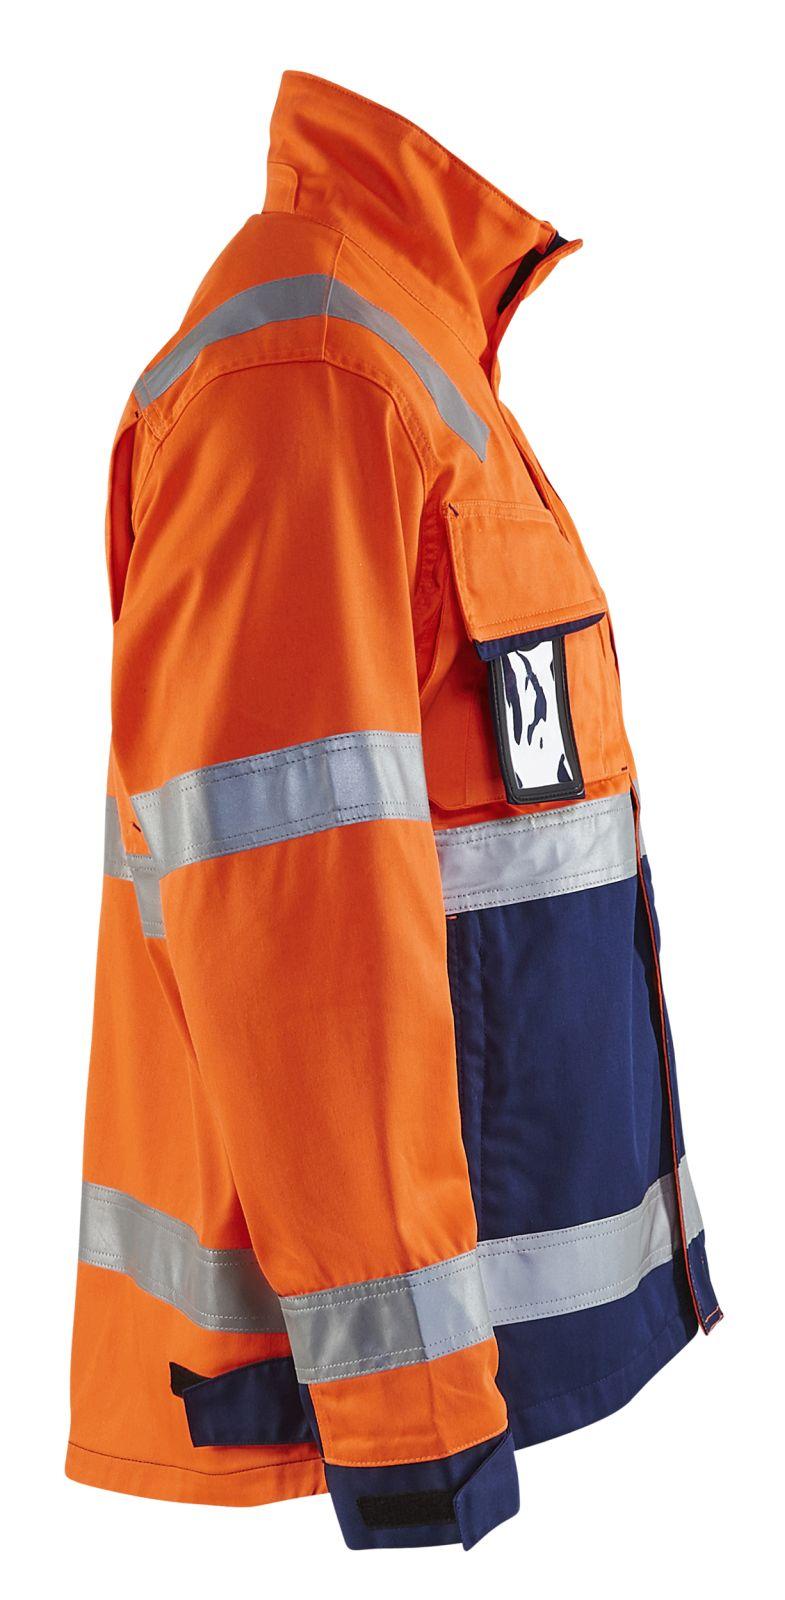 Blaklader Combi-jacks 40641811 High Vis oranje-marineblauw(5389)